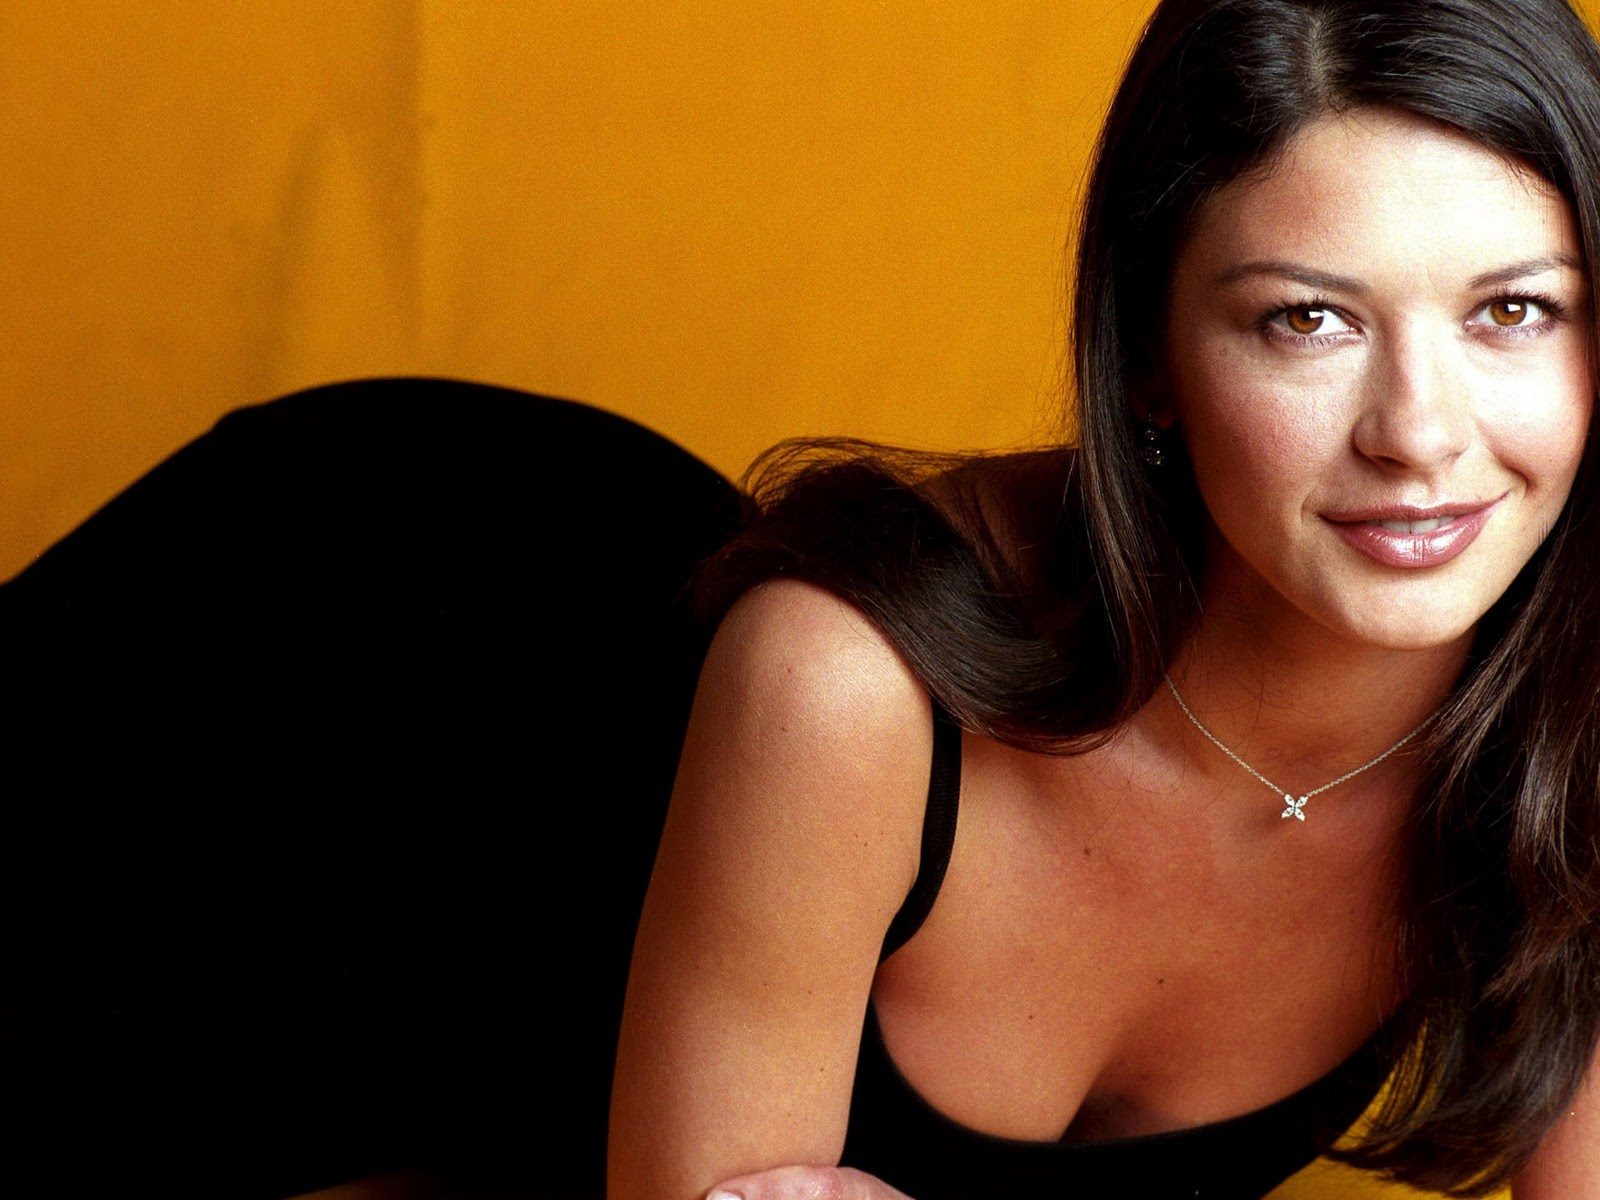 Celebs Exposure: Catherine Zeta-Jones Hot Cleavage